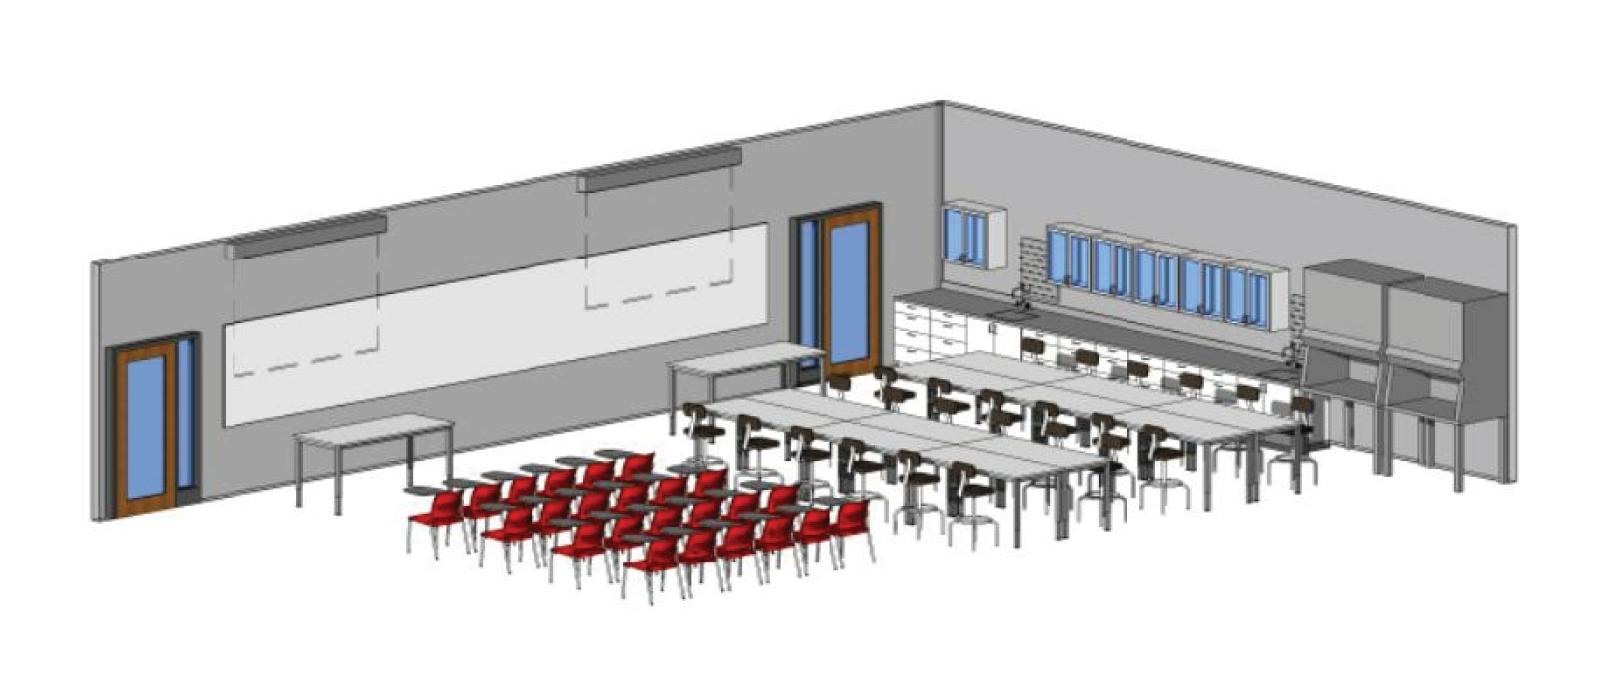 UMass Amherst, SPHHS Master Plan Study